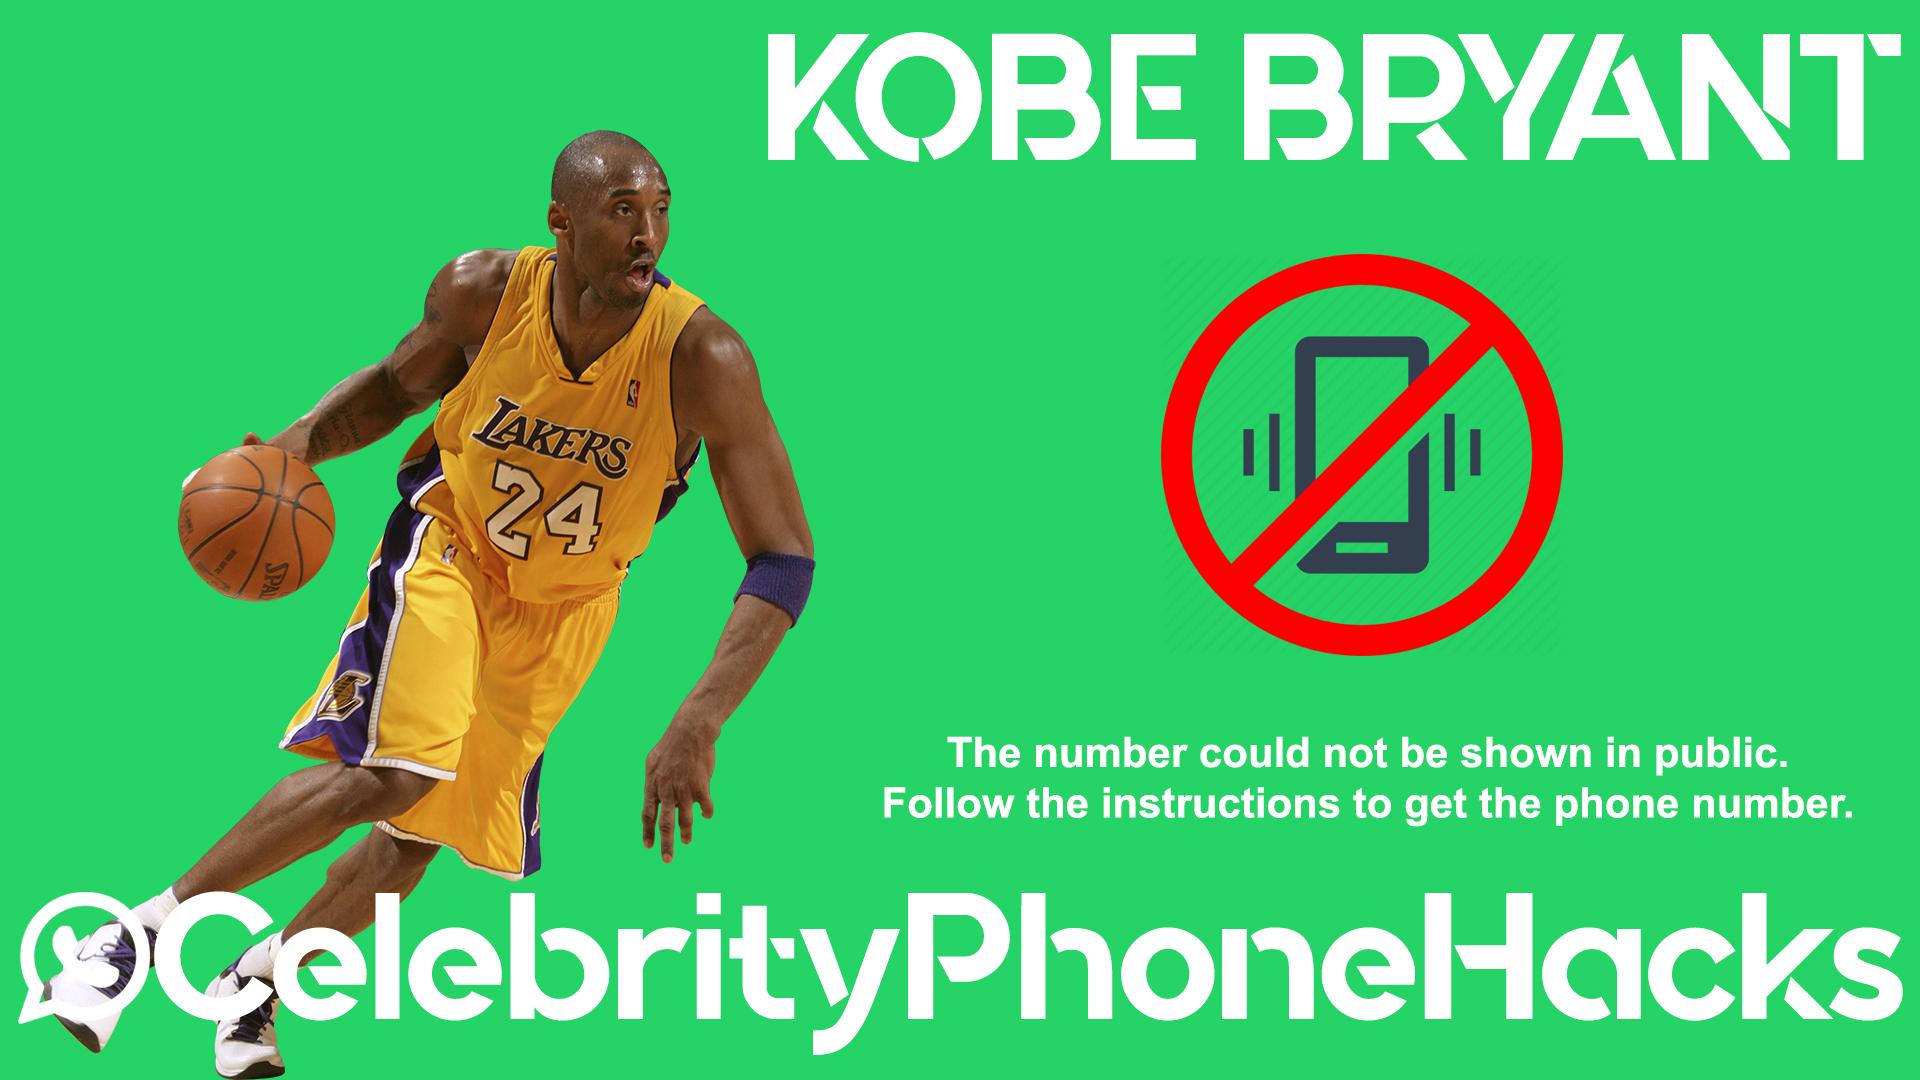 Kobe Bryant real phone number 2019 whatsapp hacked leaked